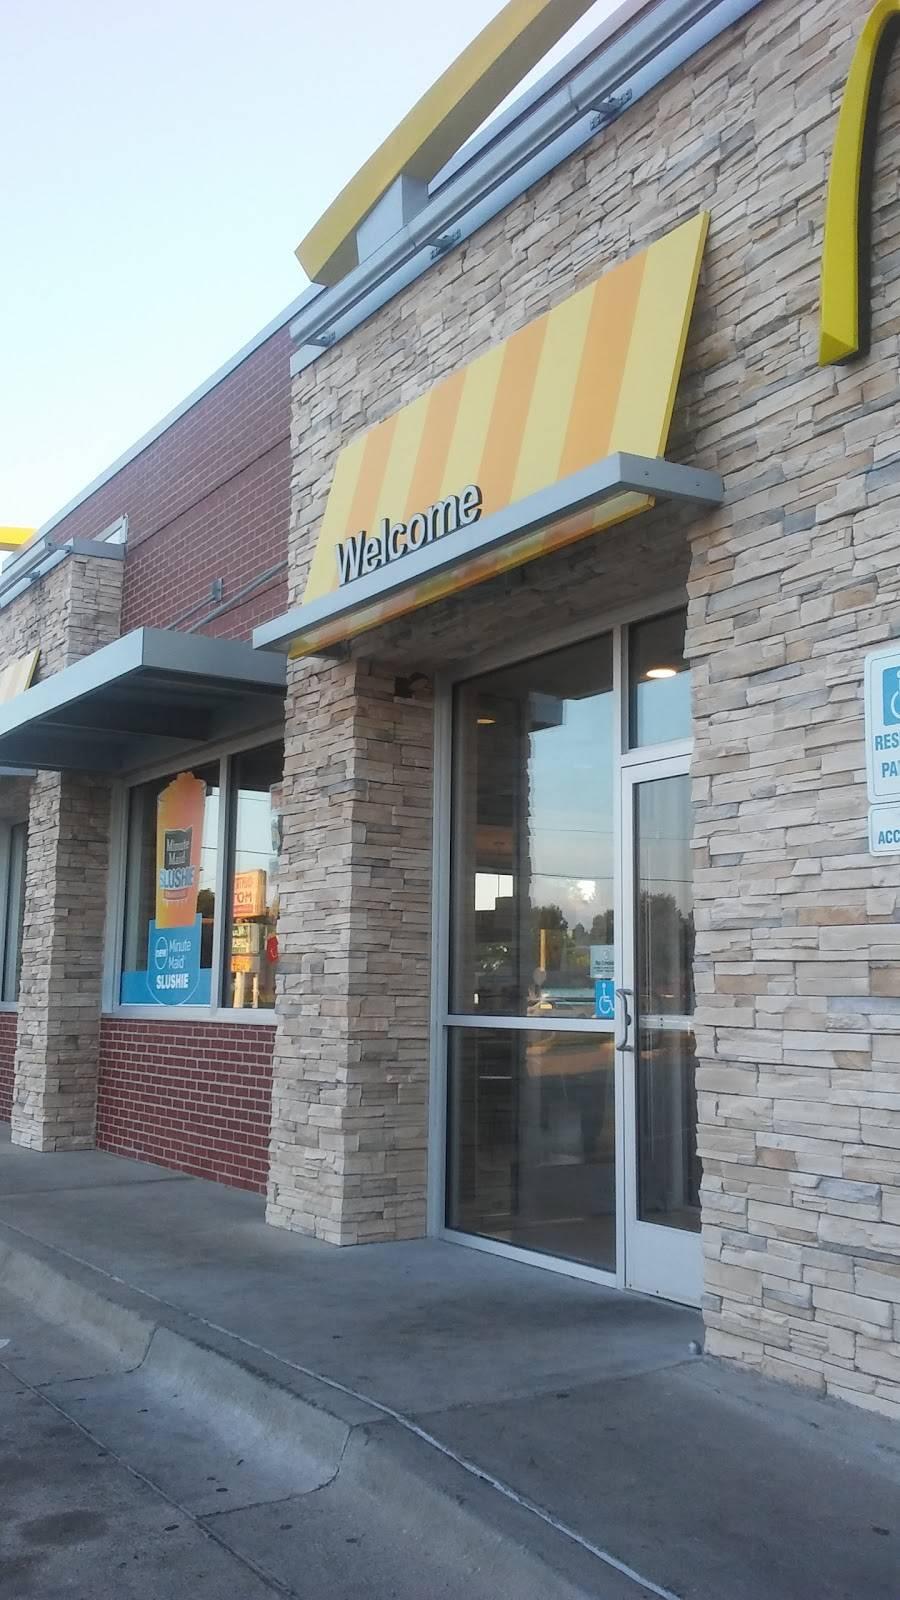 McDonalds   cafe   424 E Hwy, Holdenville, OK 74848, USA   4053793966 OR +1 405-379-3966